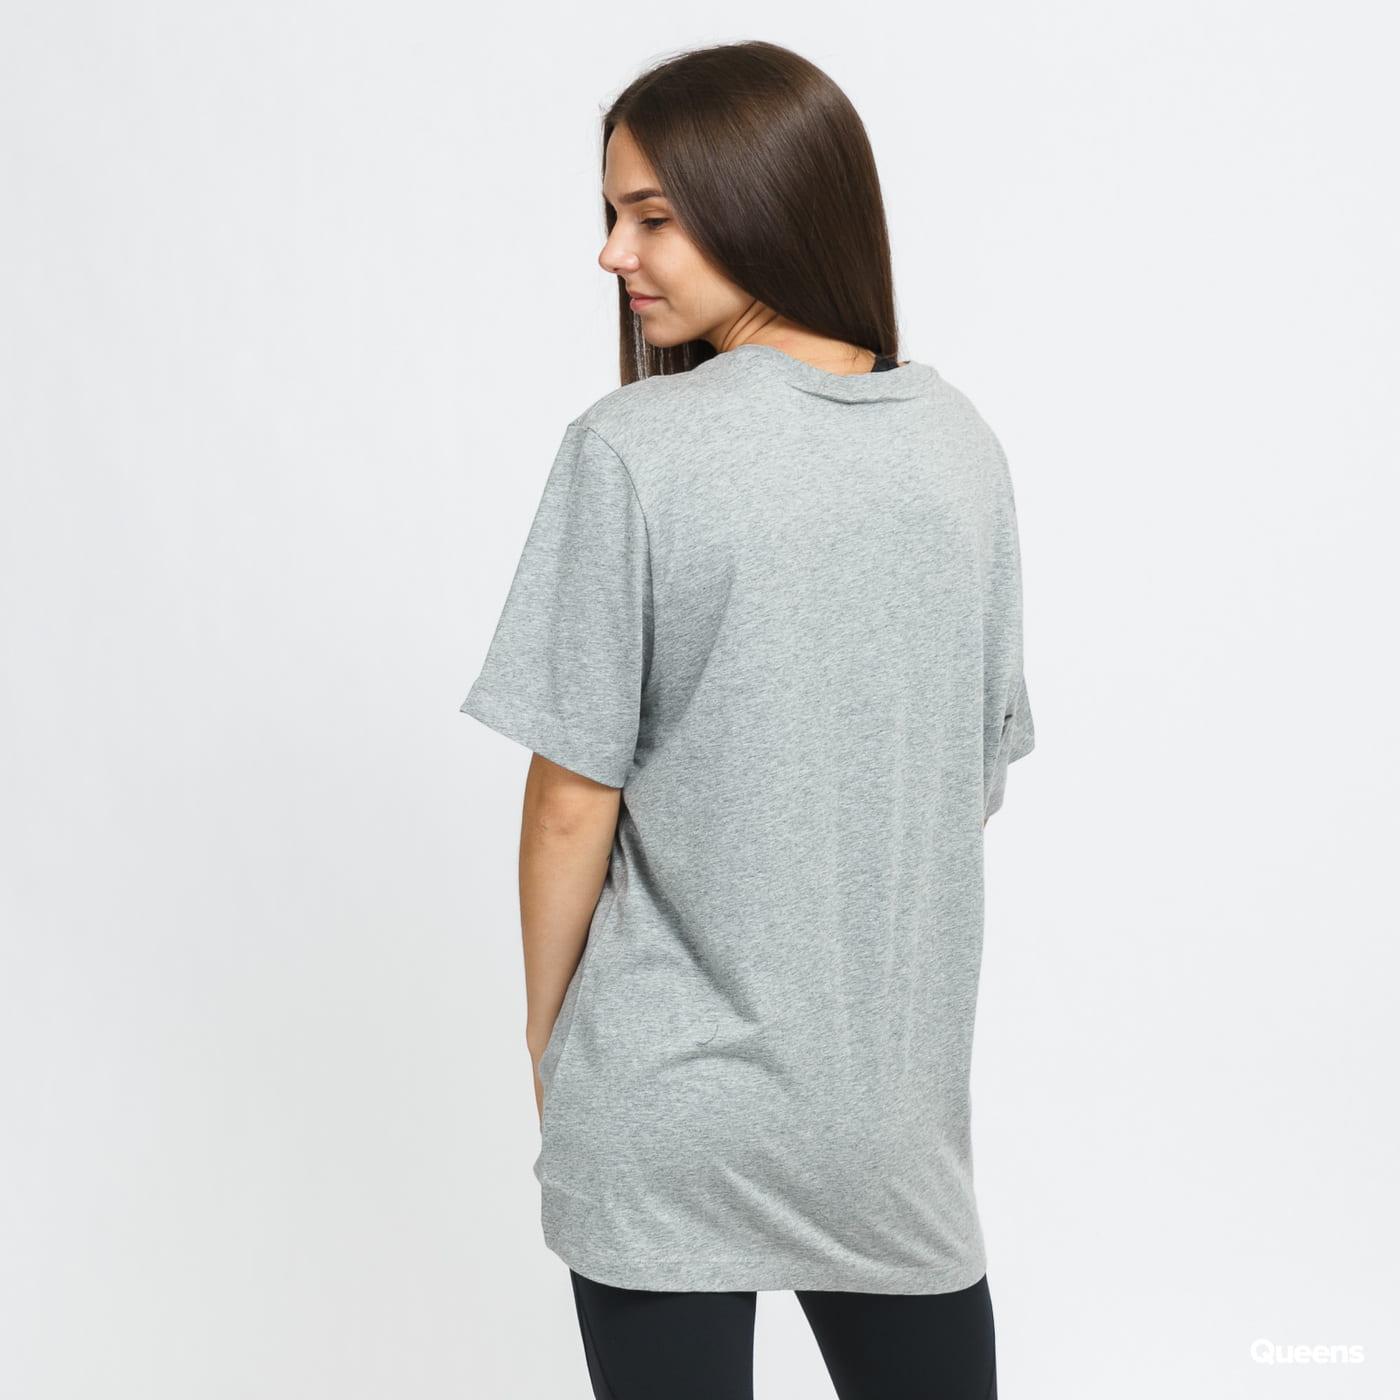 Nike M NSW Tee Icon Futura melange šedé